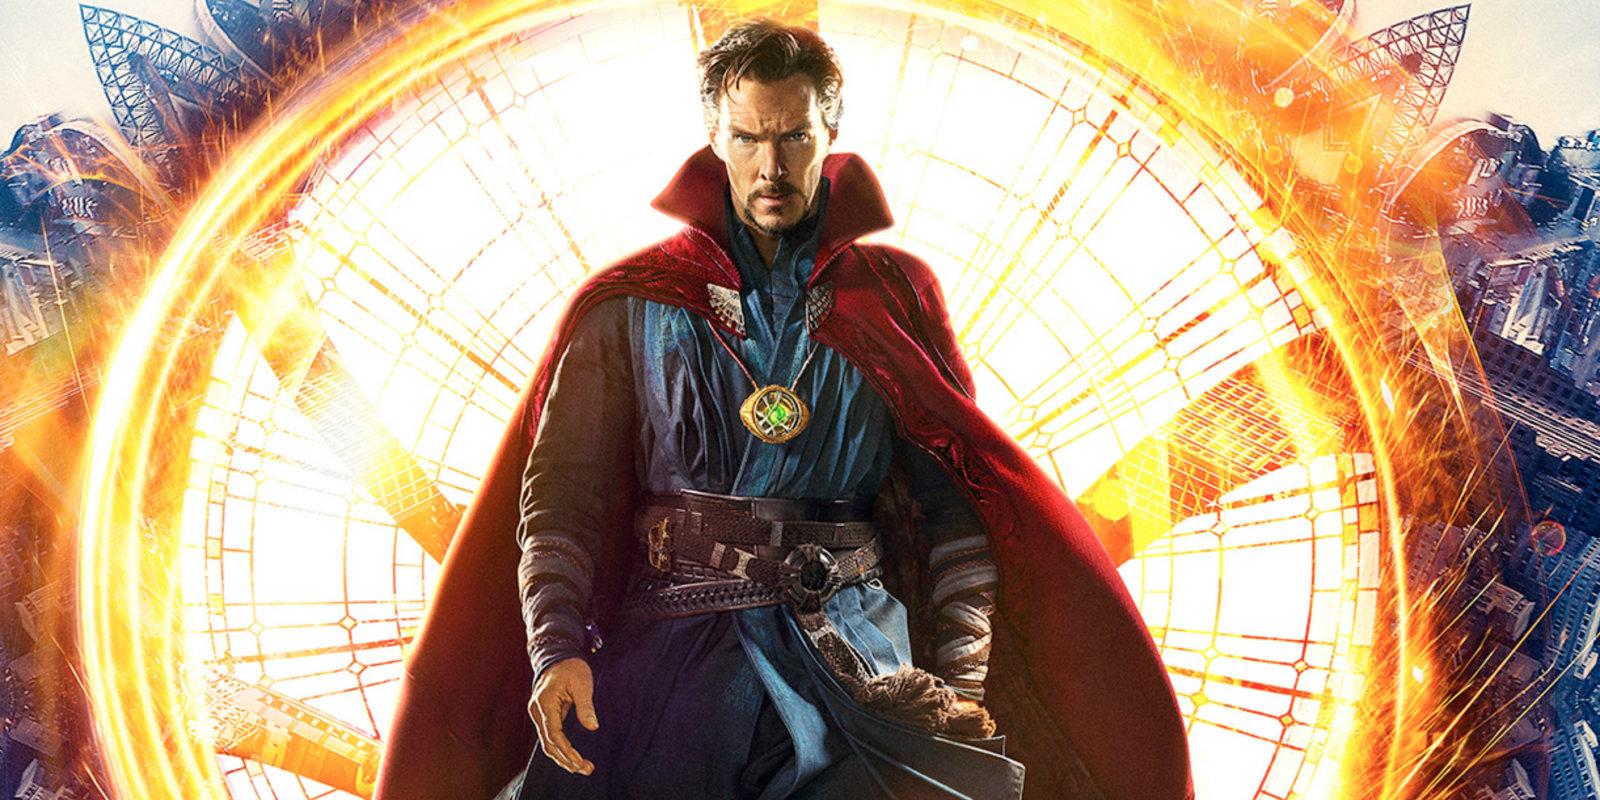 La magia llega a Marvel con 'Doctor Strange'